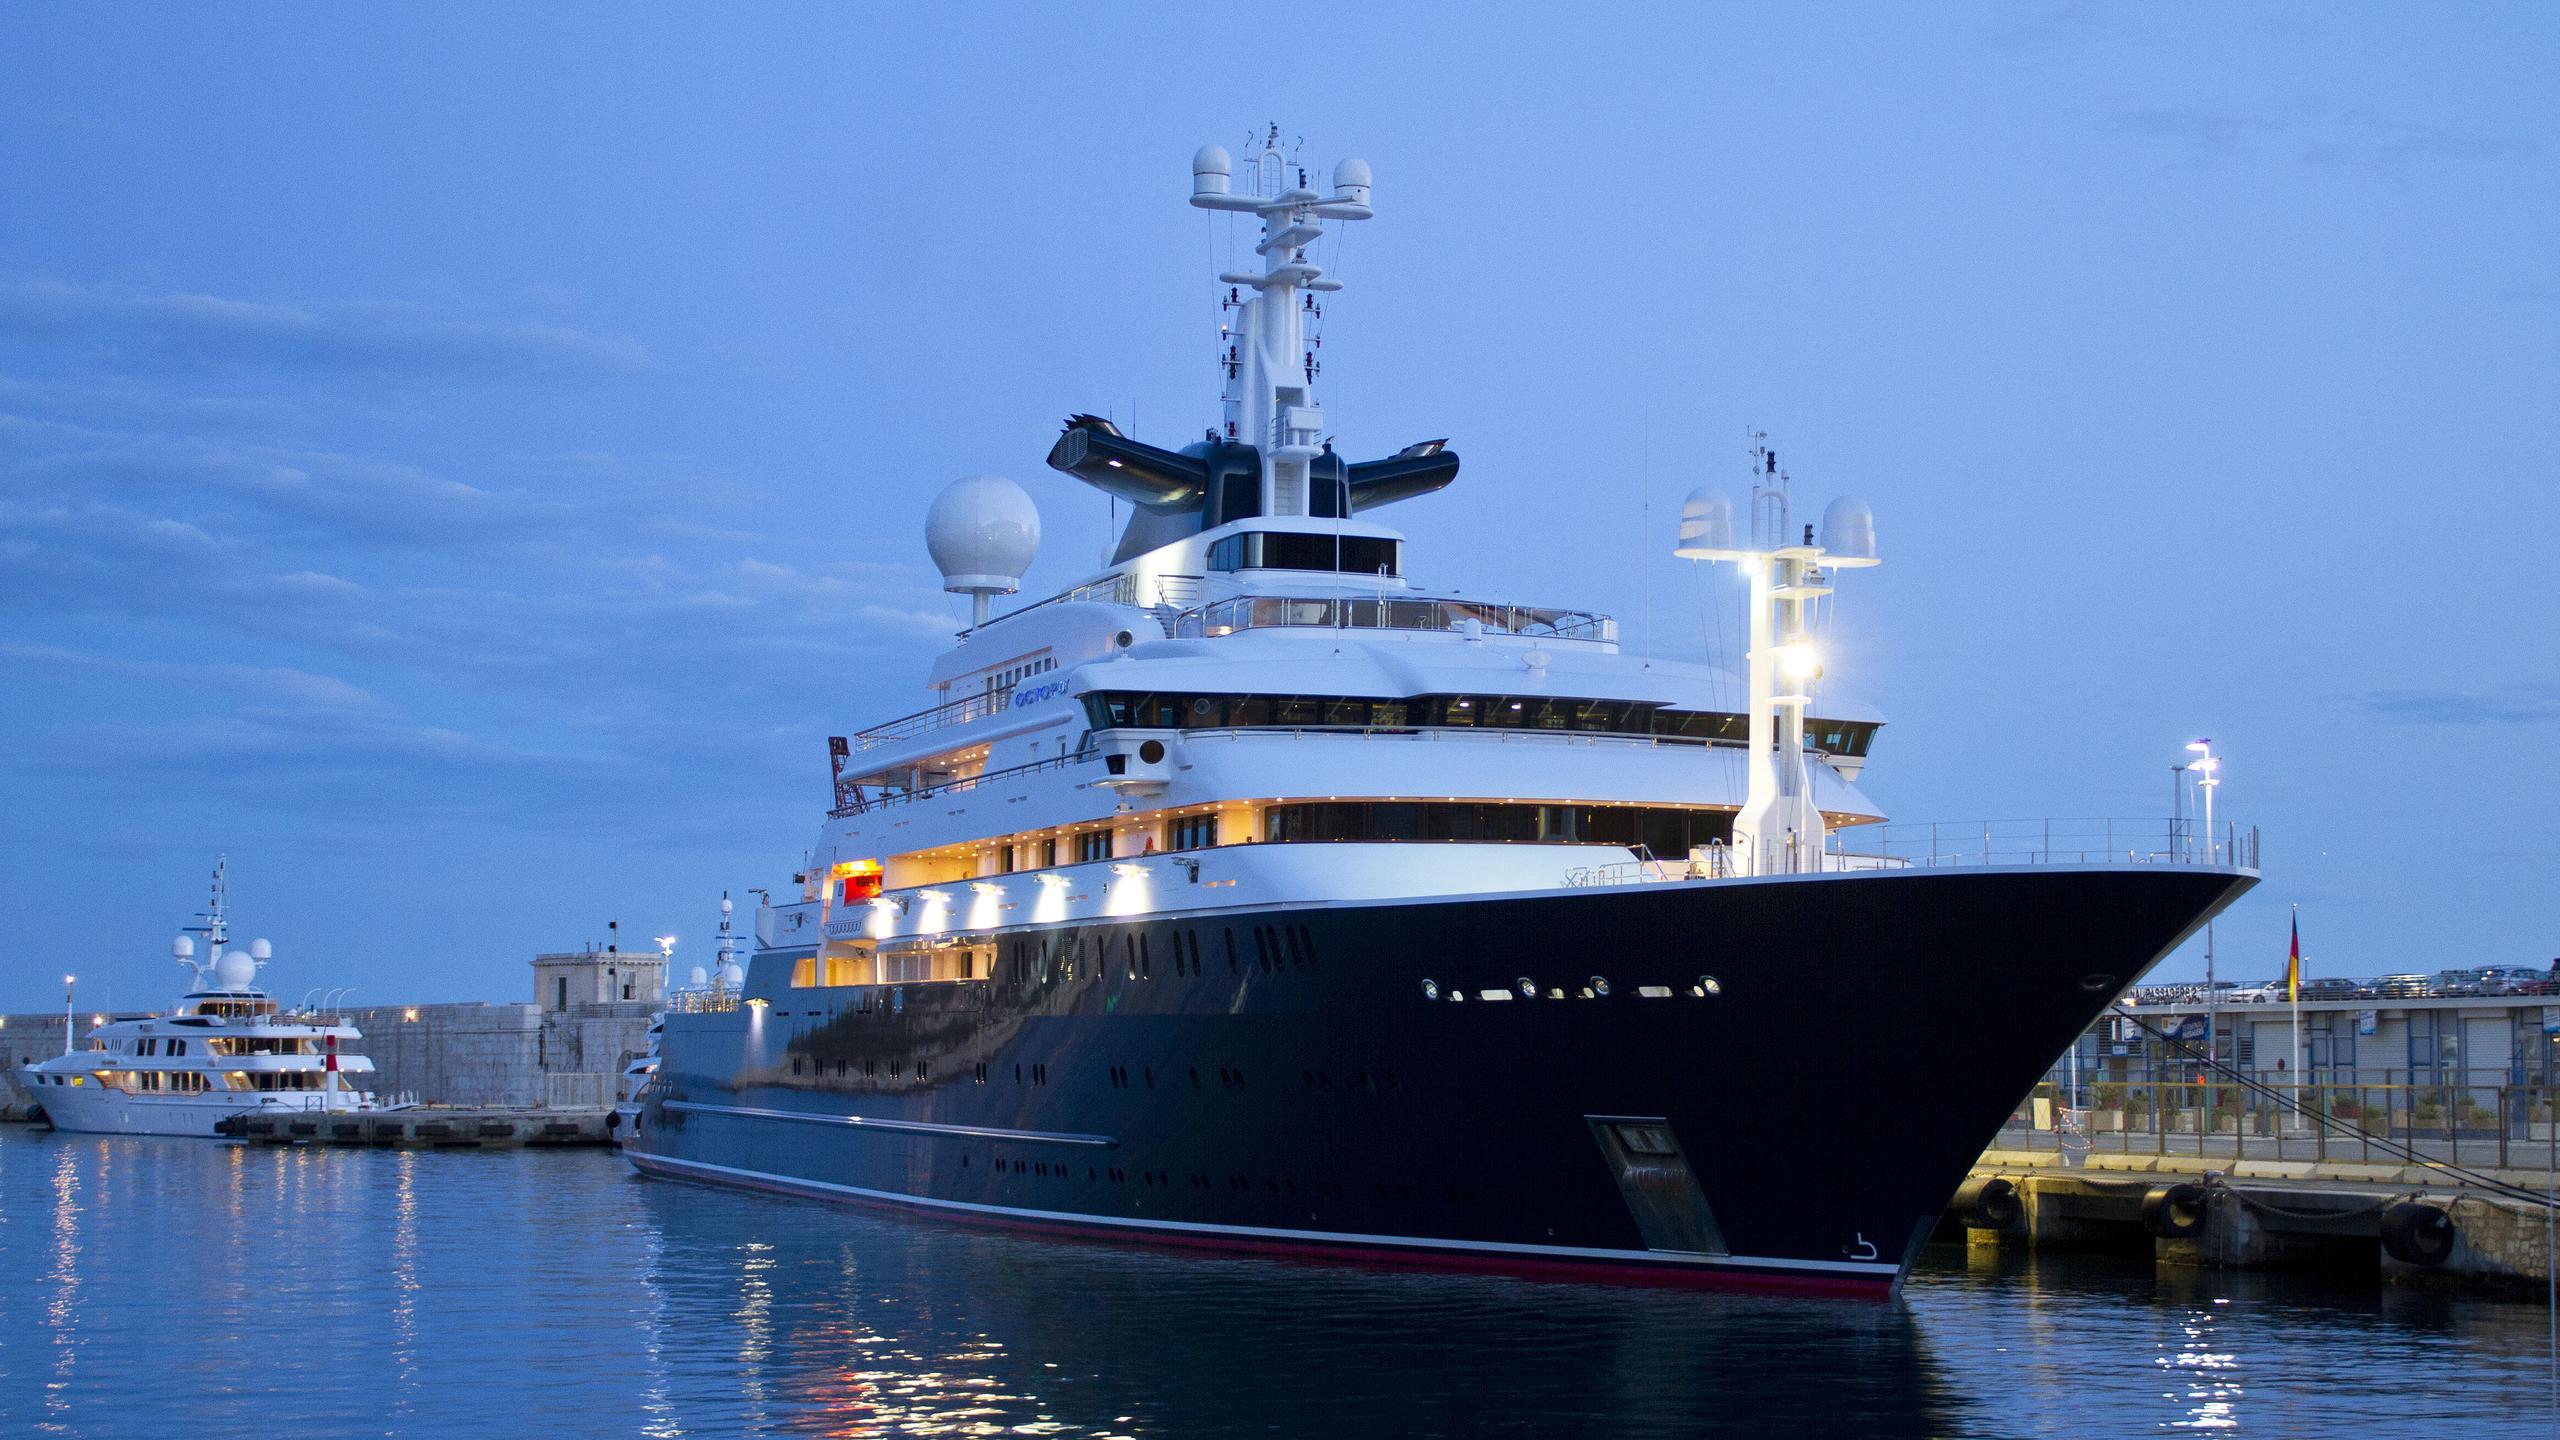 octopus-explorer-yacht-lurssen-2003-126m-half-profile